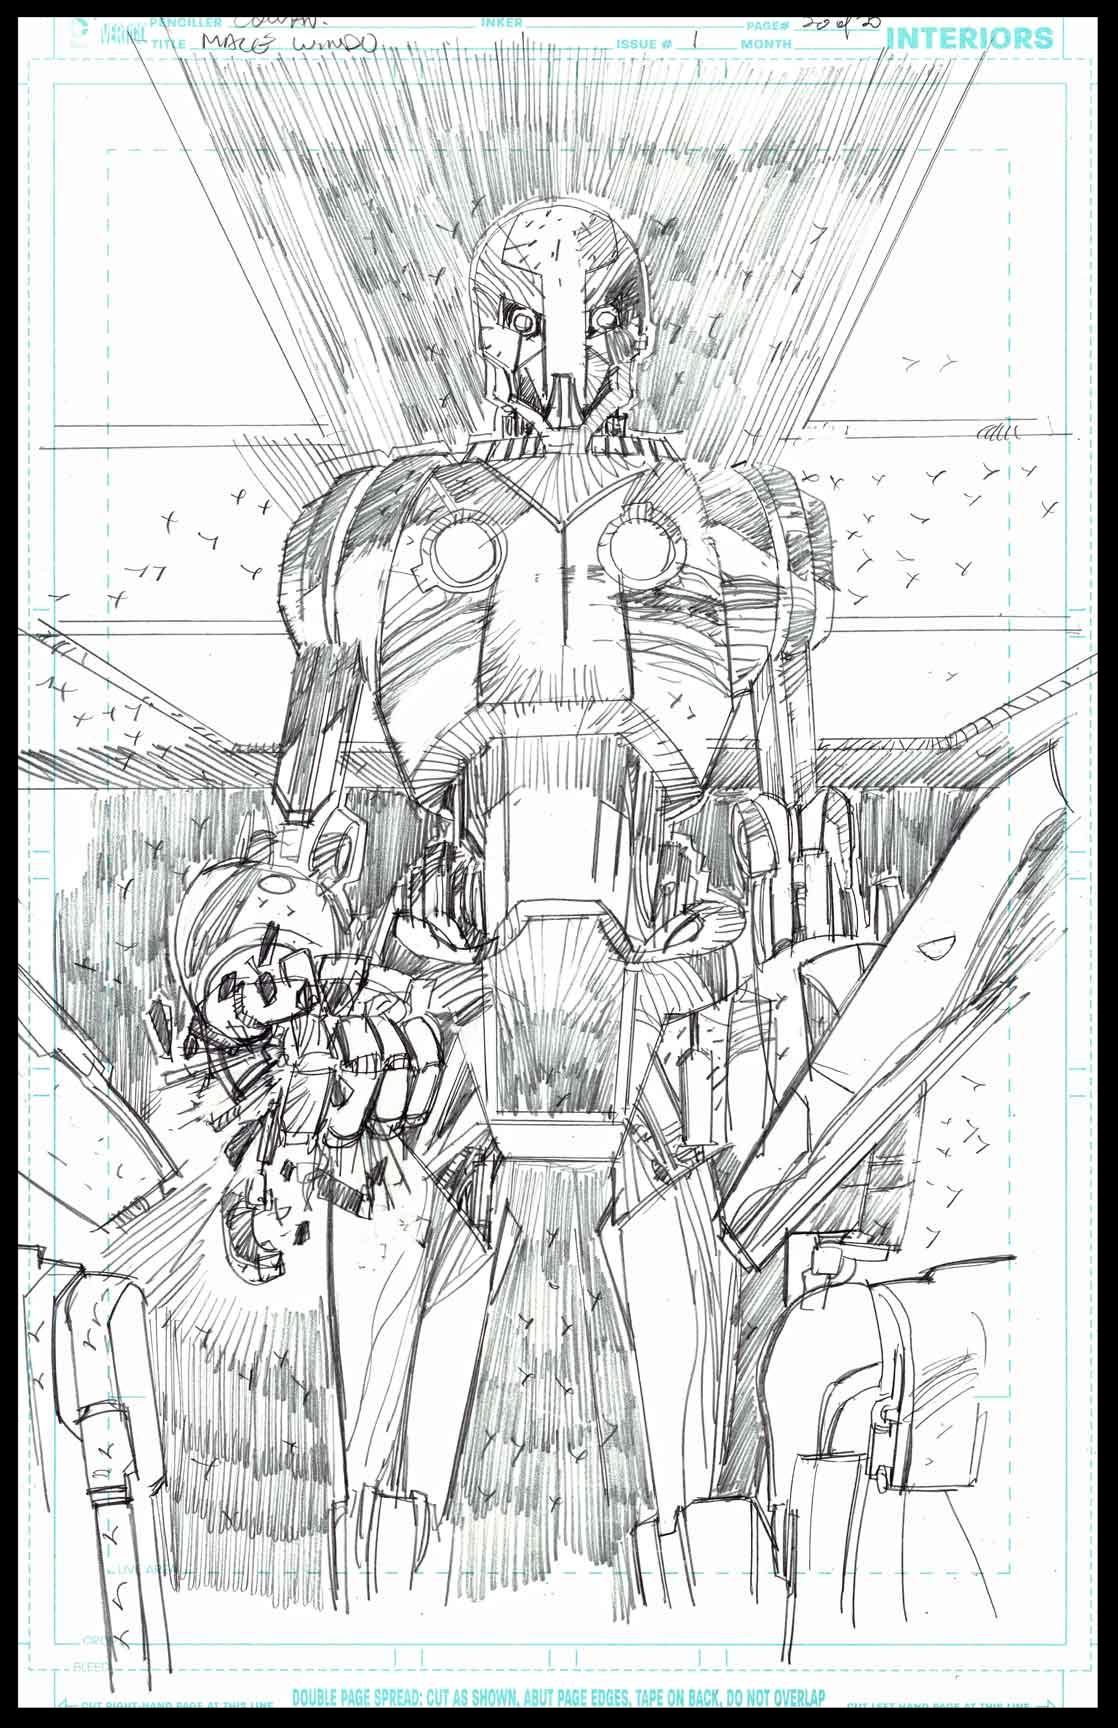 Mace Windu #1 - Page 20 - Pencils